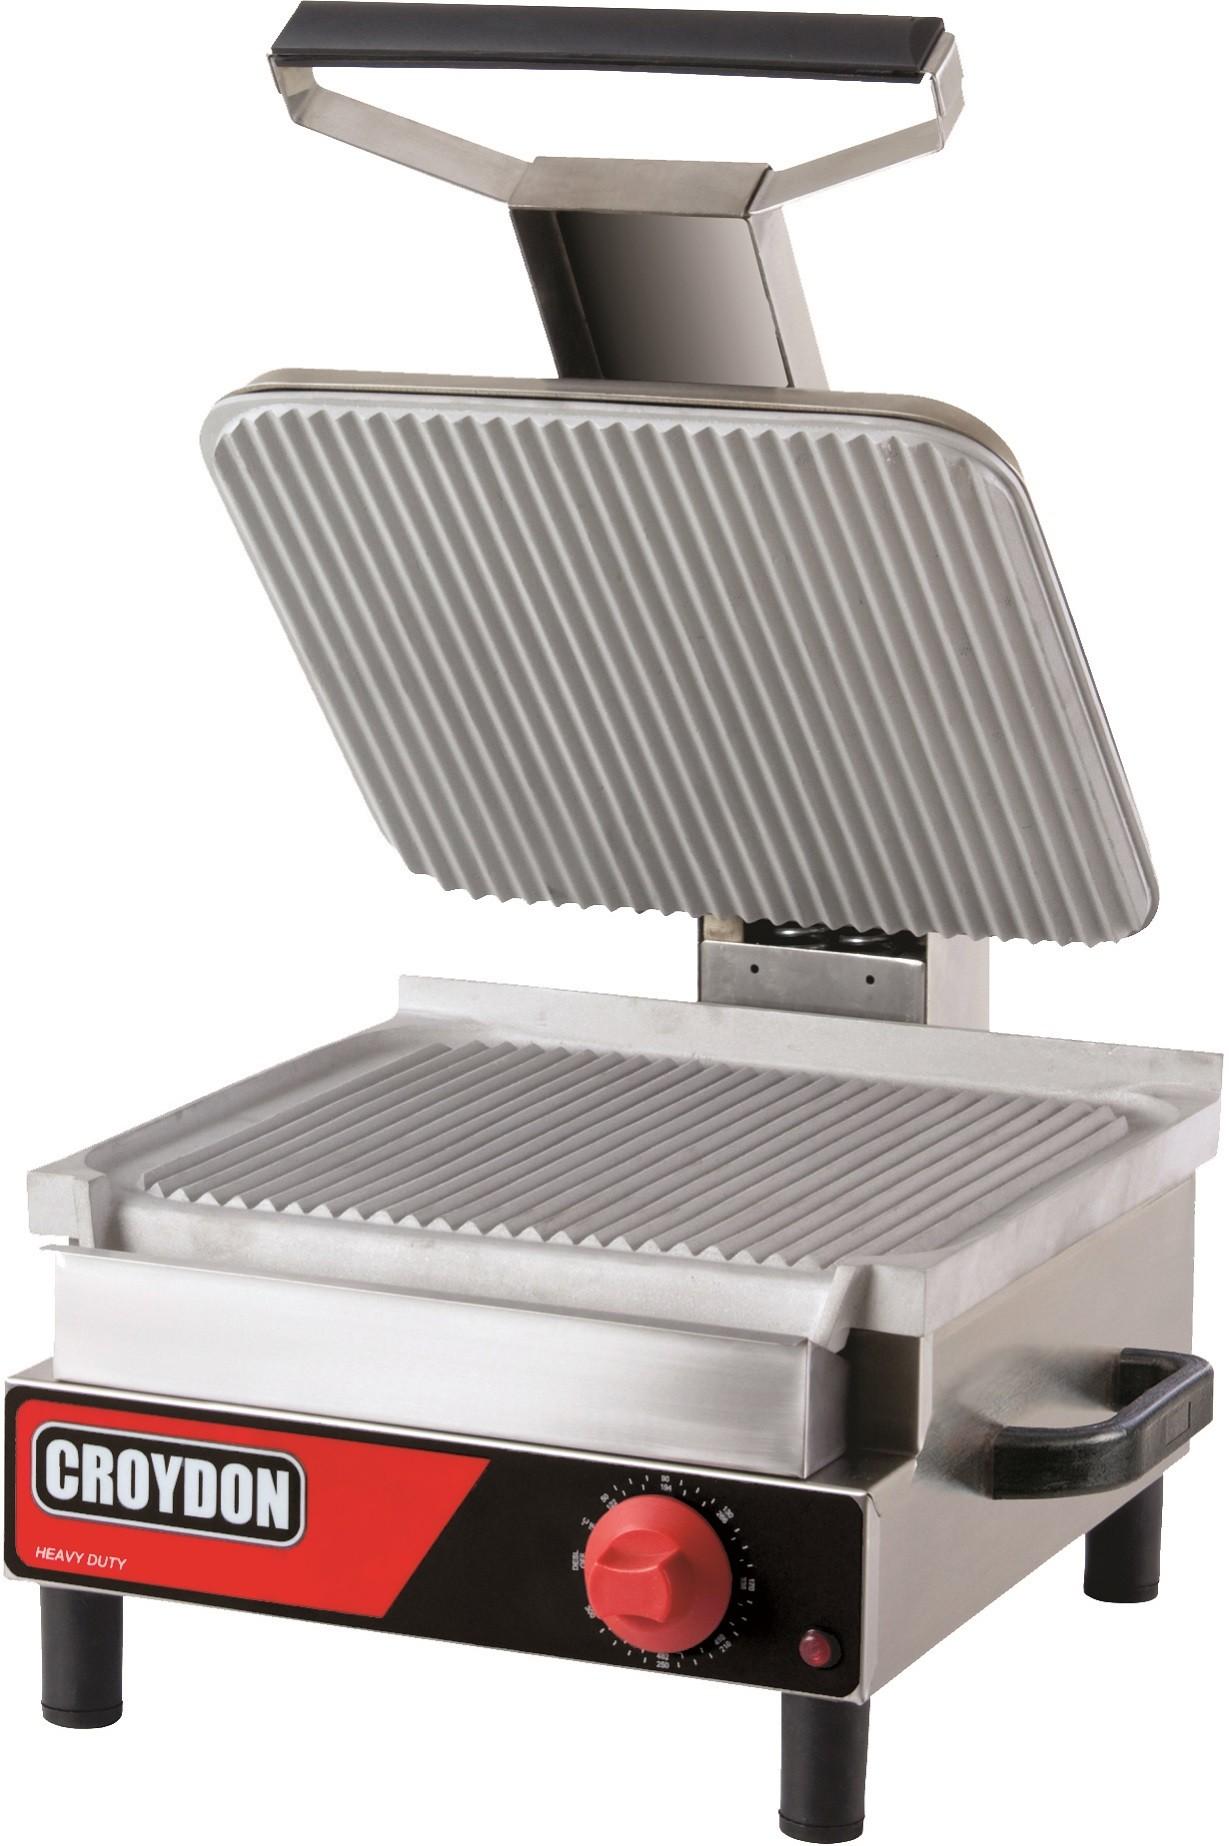 Sanduicheira Eletrica Simples (Chapa Estriada) 220V - Croydon